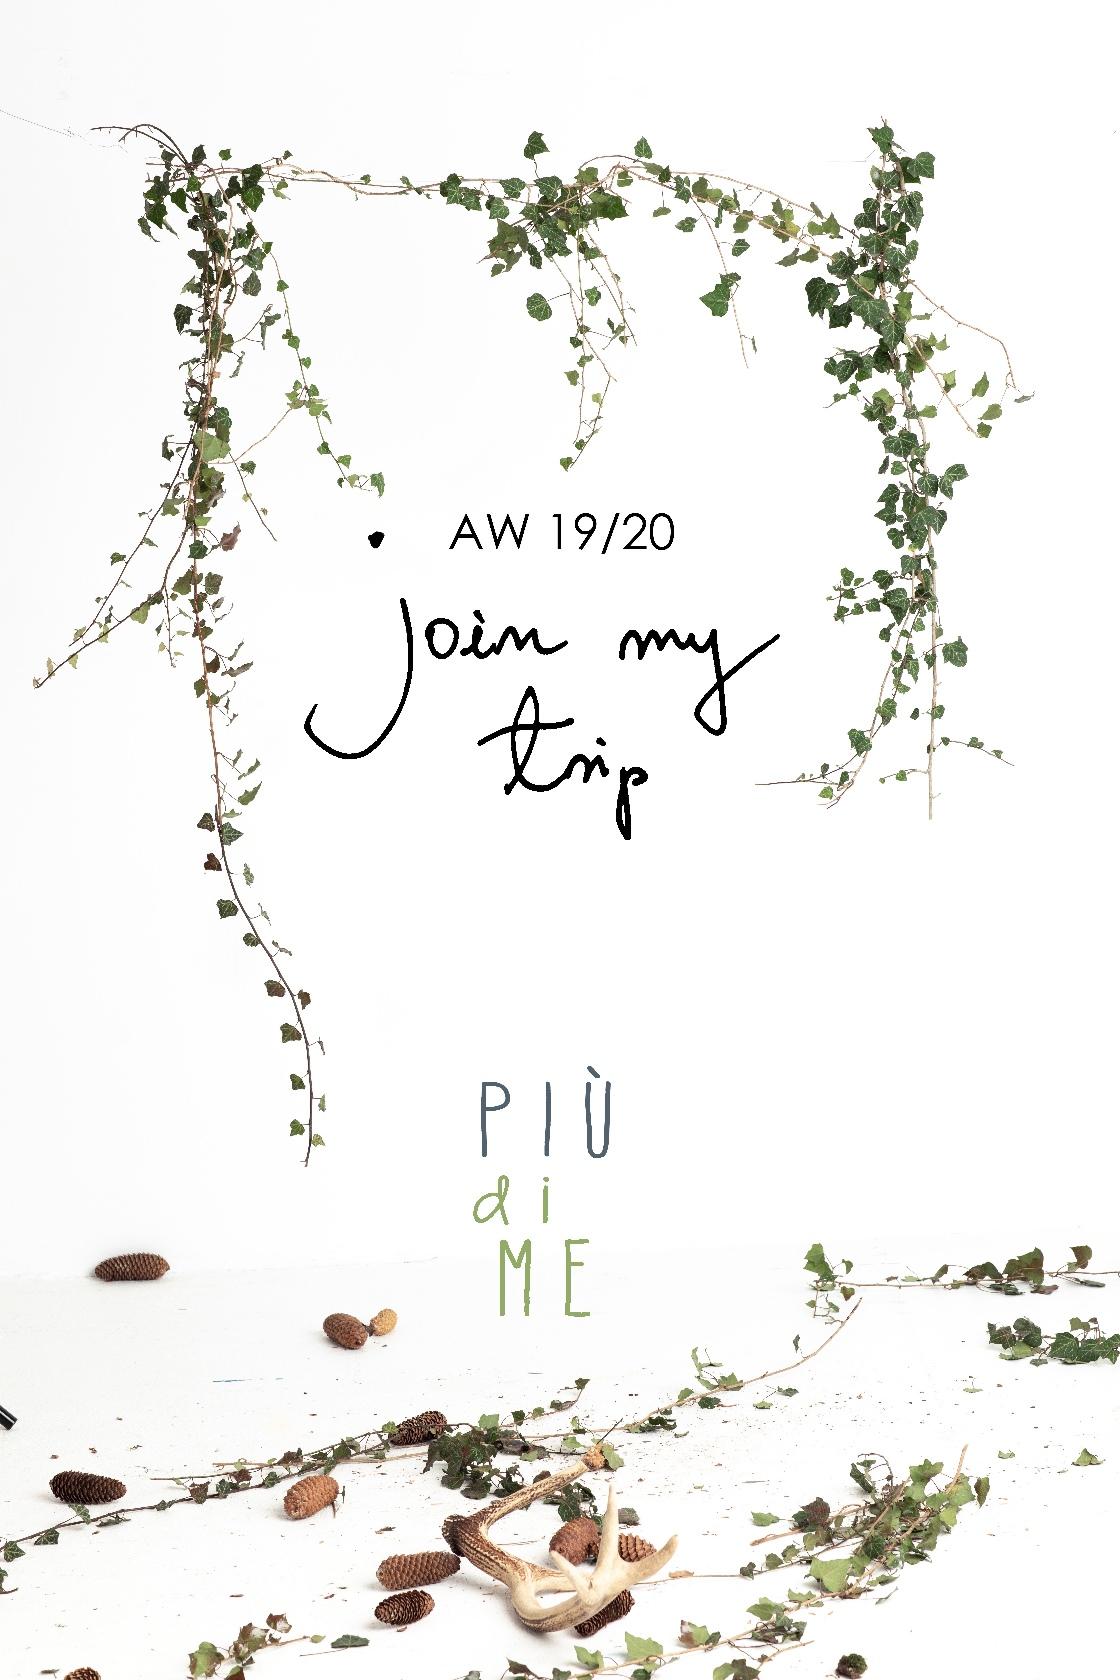 Piu di Me AW19 - Join my trip